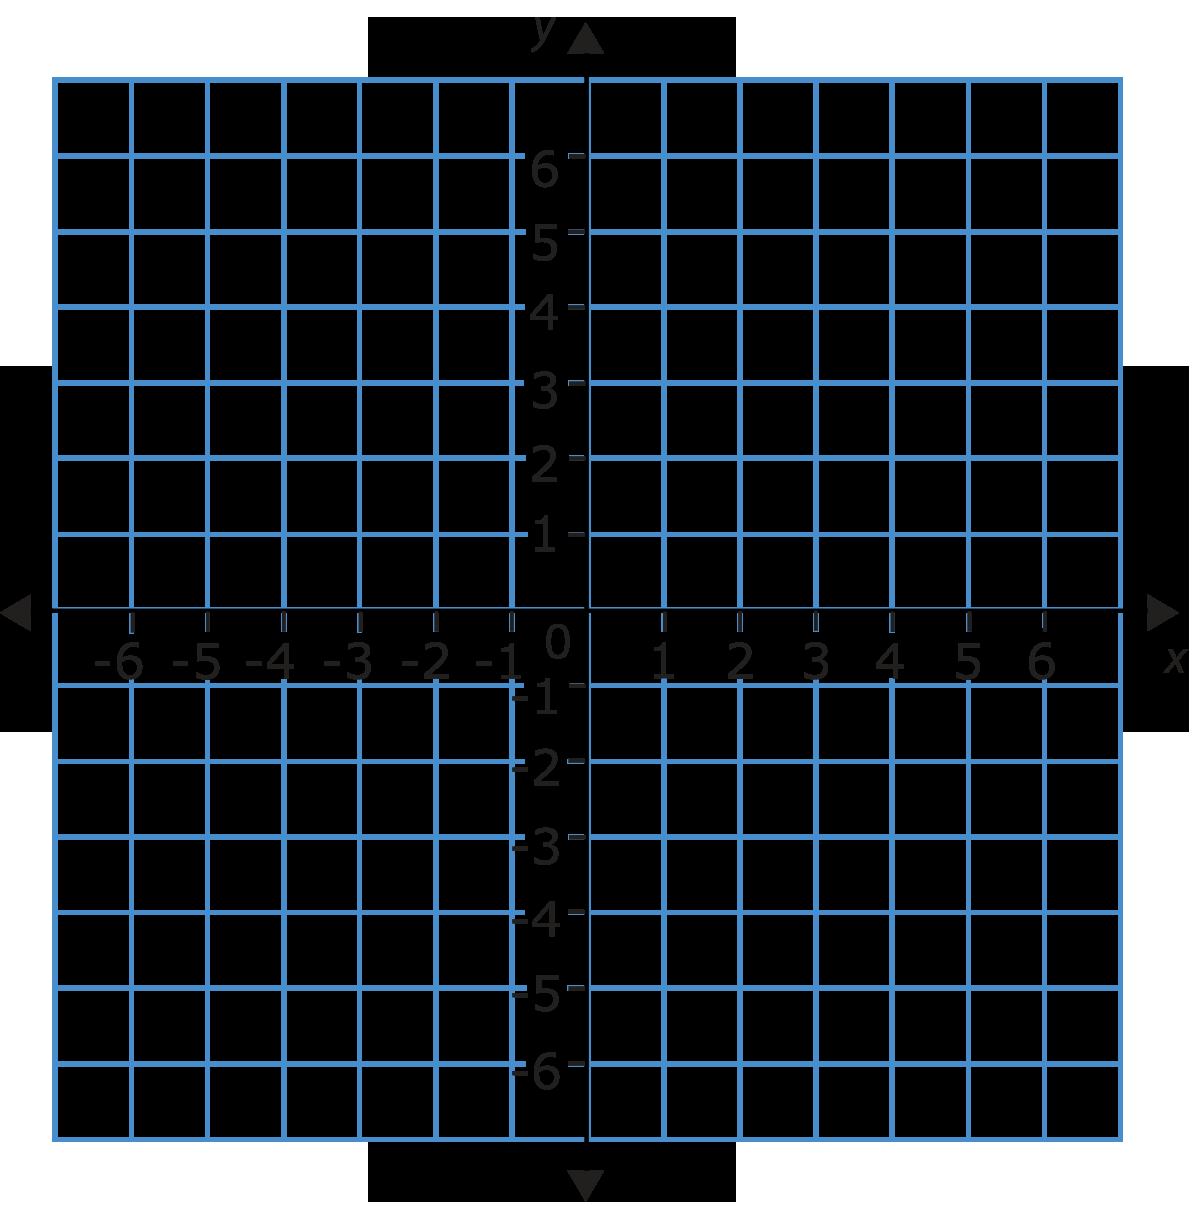 medium resolution of Interactive coordinate plane for smartboards.   Coordinate plane